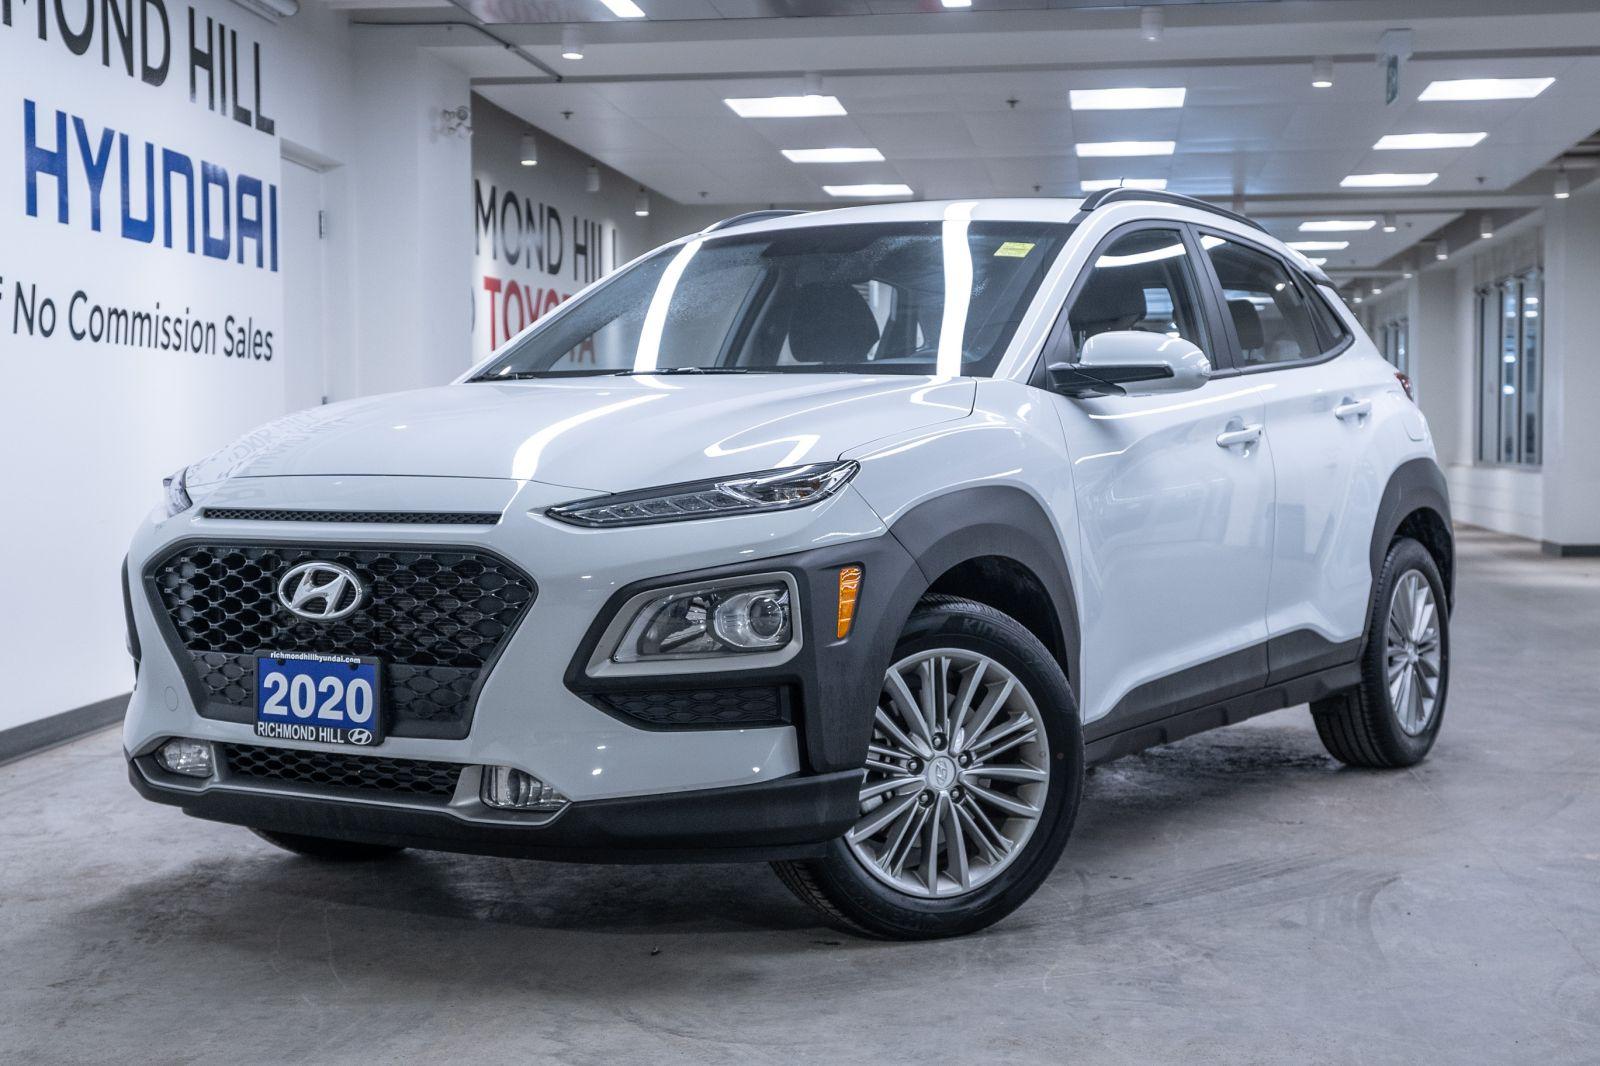 2020 Hyundai Kona Preferred / Reverse Camera / Heated Steering Wheel / Alloys / Brake Assist / Heated Seats